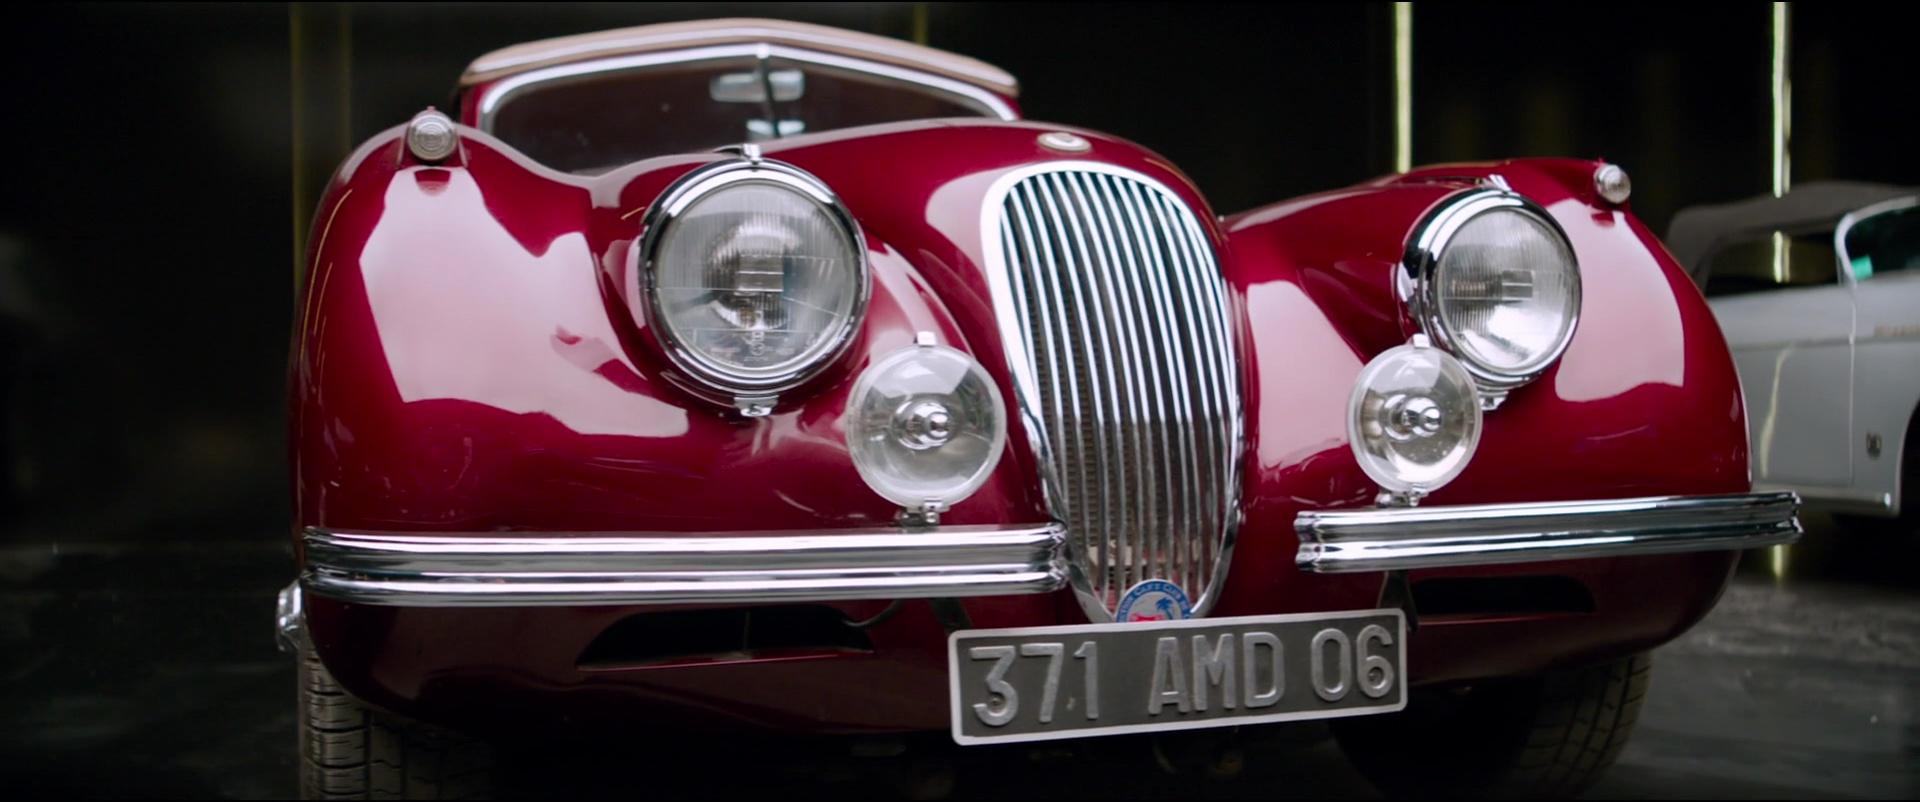 1953 Jaguar Xk 120 In Overdrive 2017 Movie